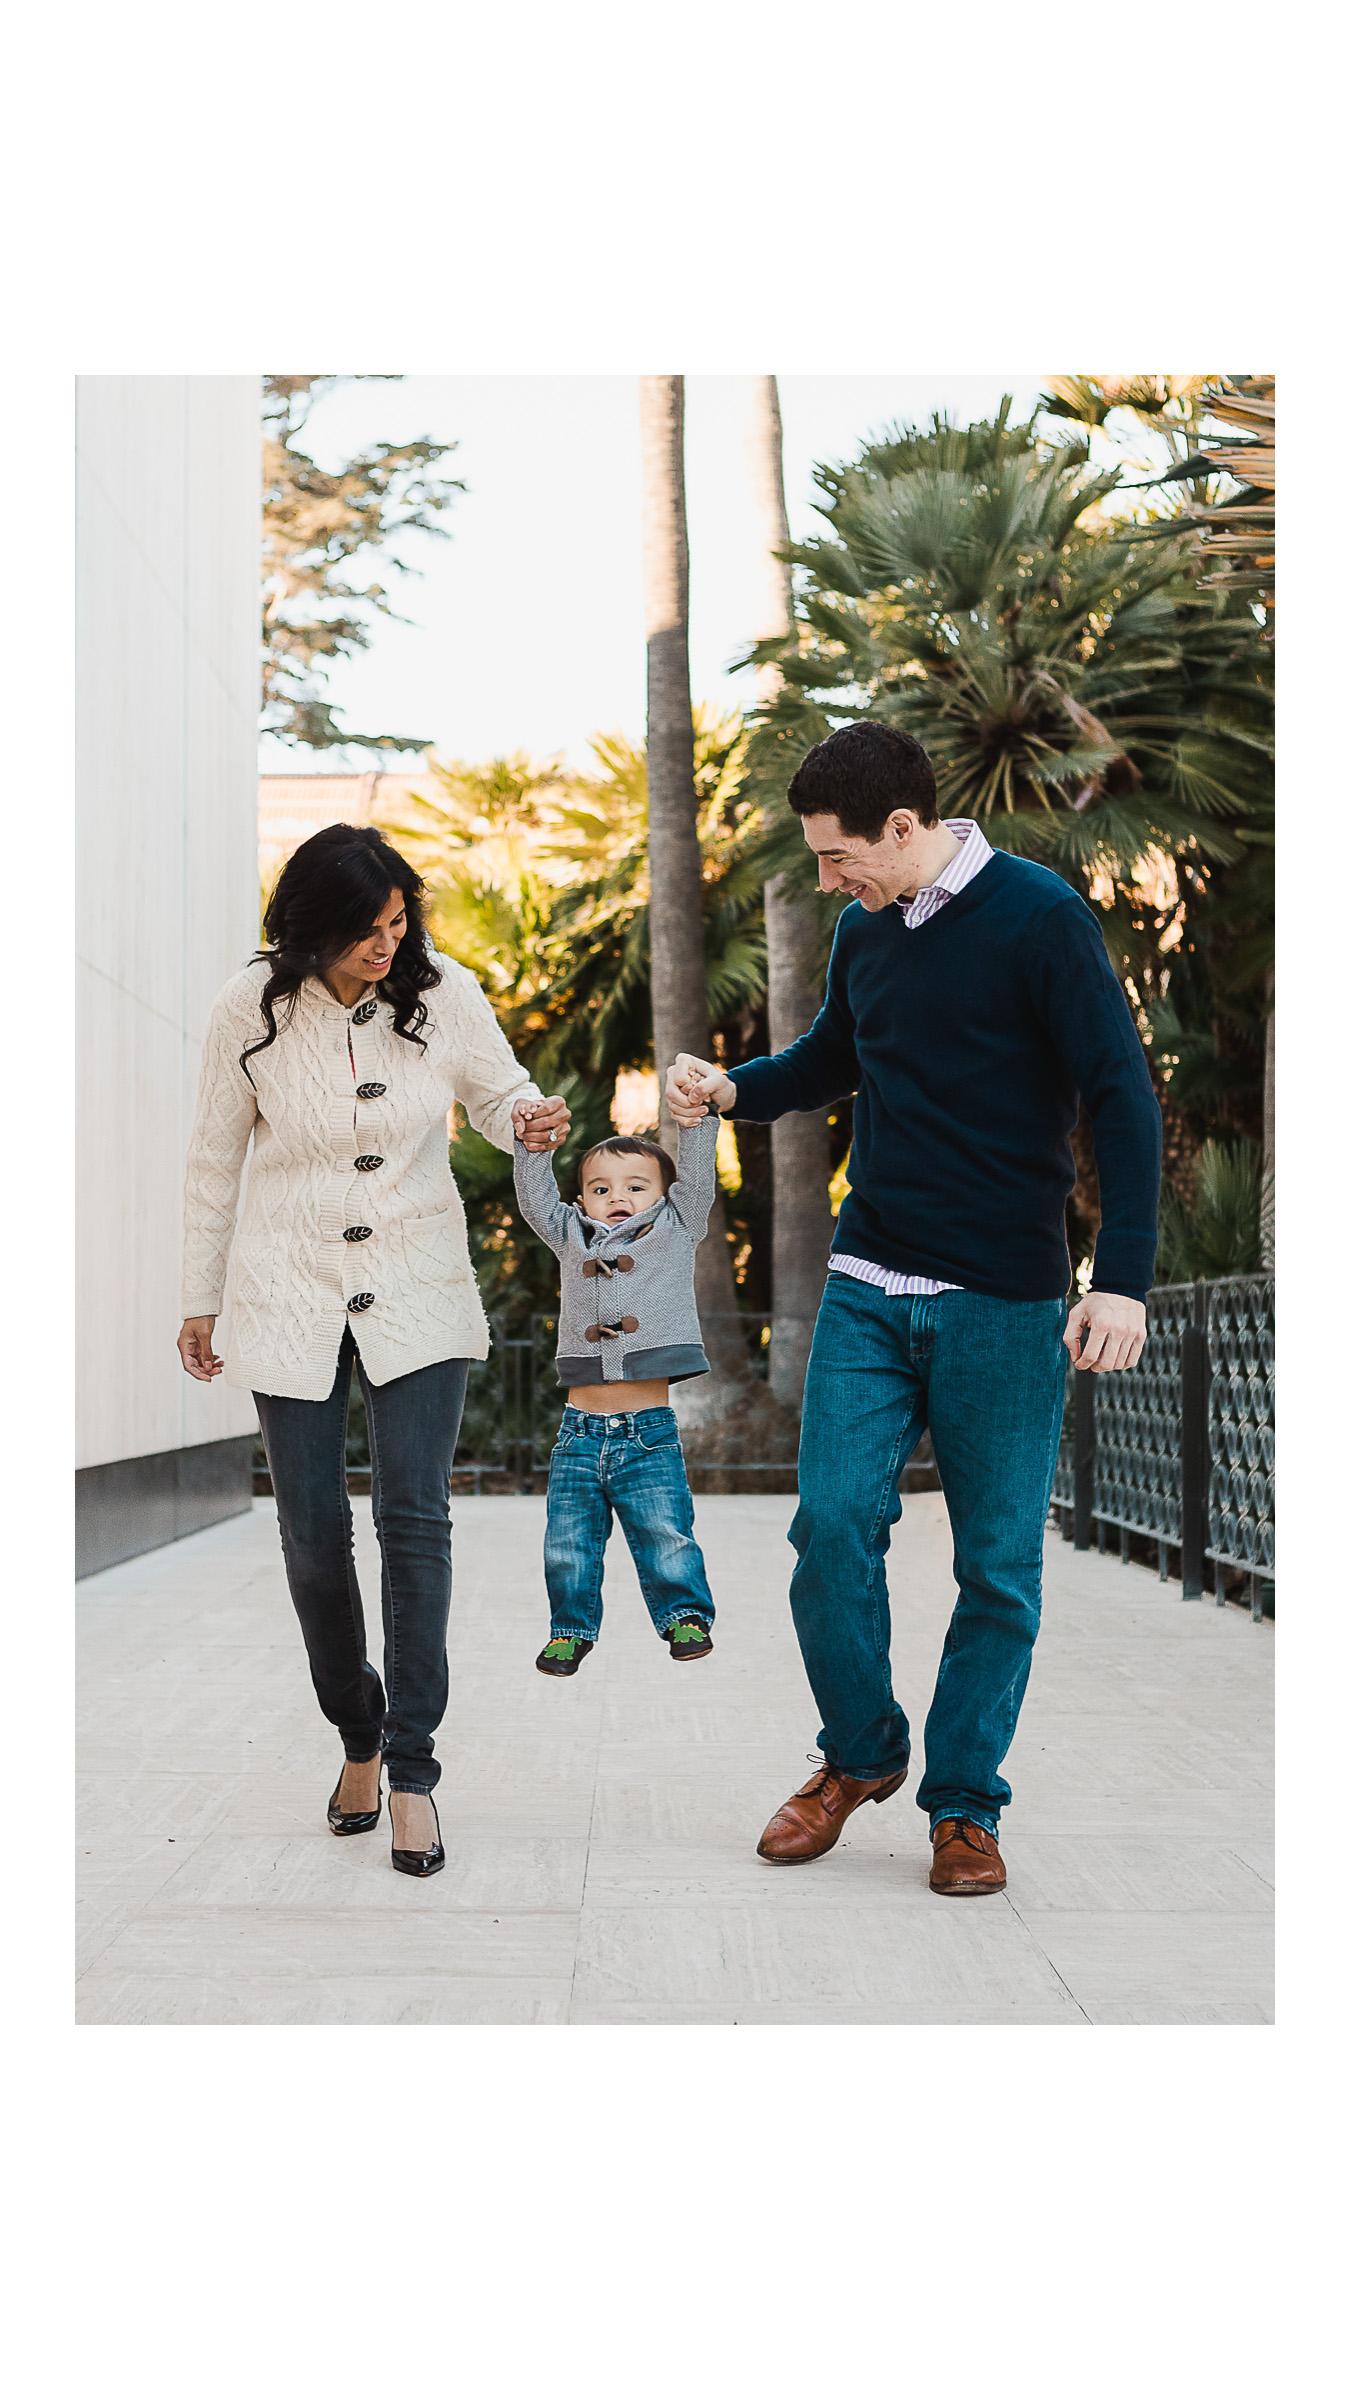 San Diego Family Photography in Balboa Park